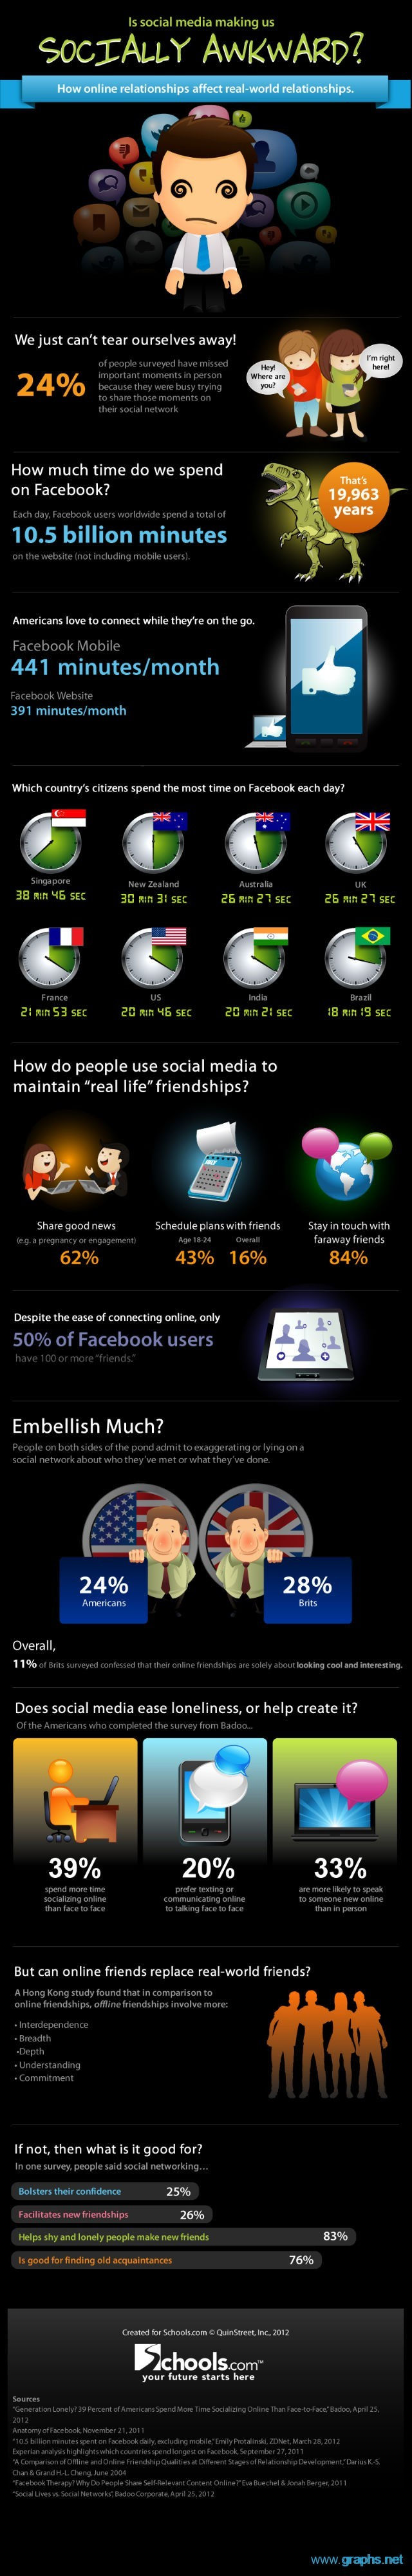 social media socially awkward infographic